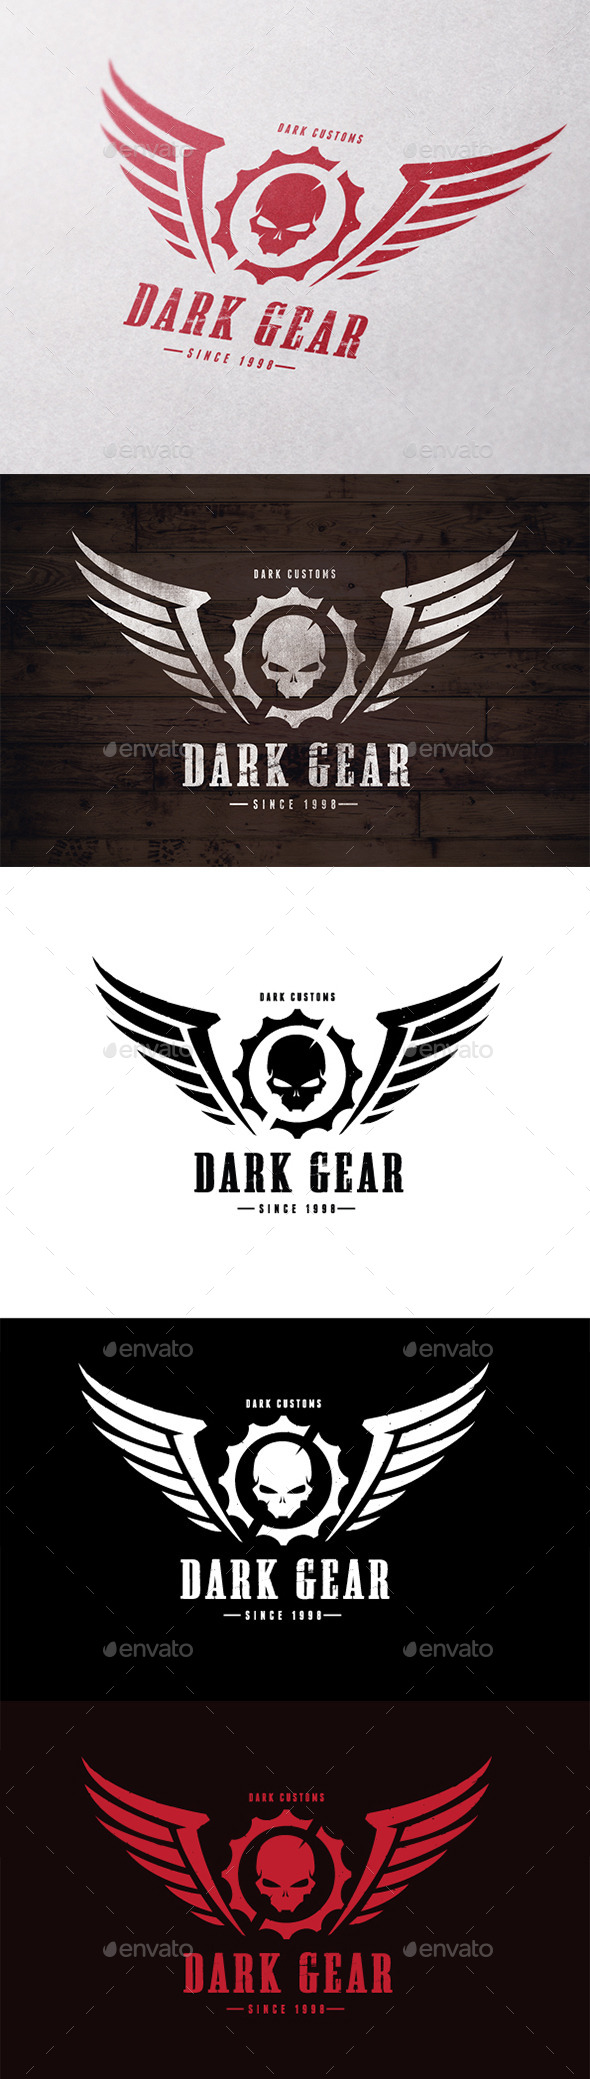 Dark Gear